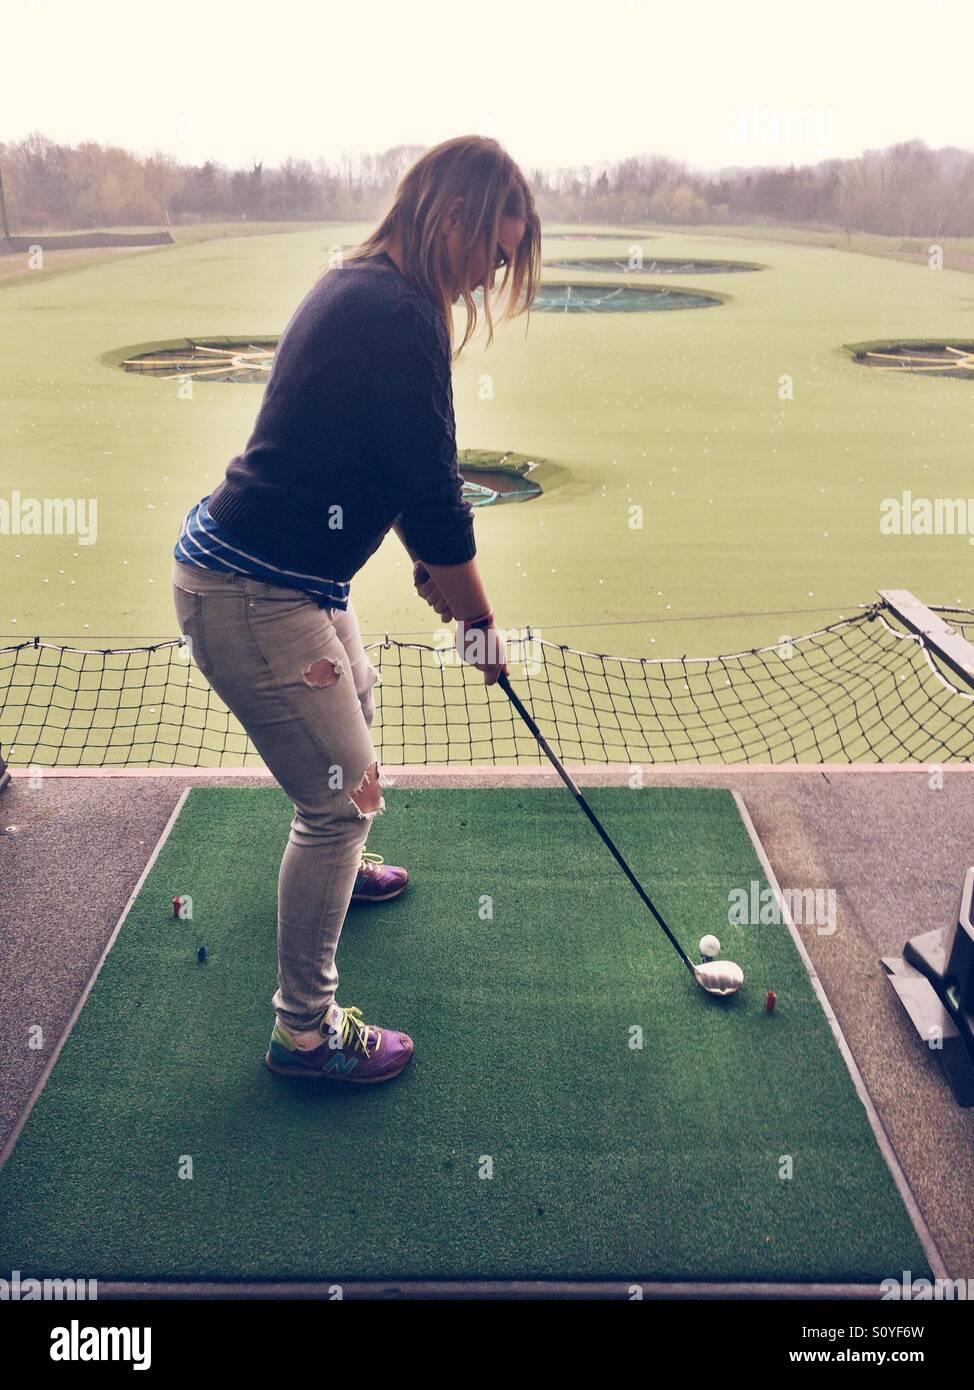 Girl playing golf at a driving  range - Stock Image